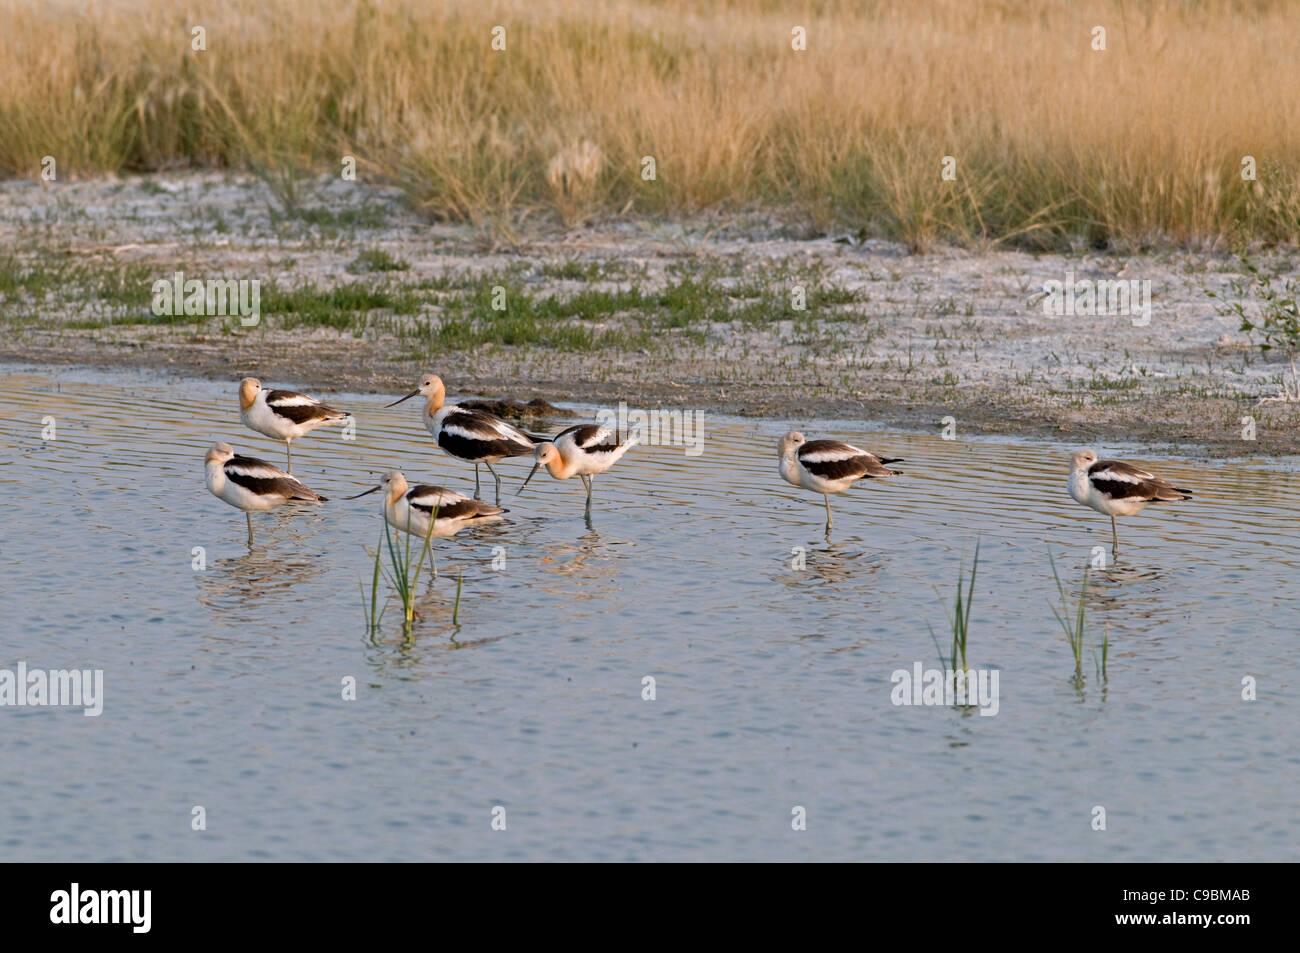 Canada Alberta Tyrrell Lake, Seven American Avocet Recurvirostra americana feeding on shore 5 standing on one leg Stock Photo